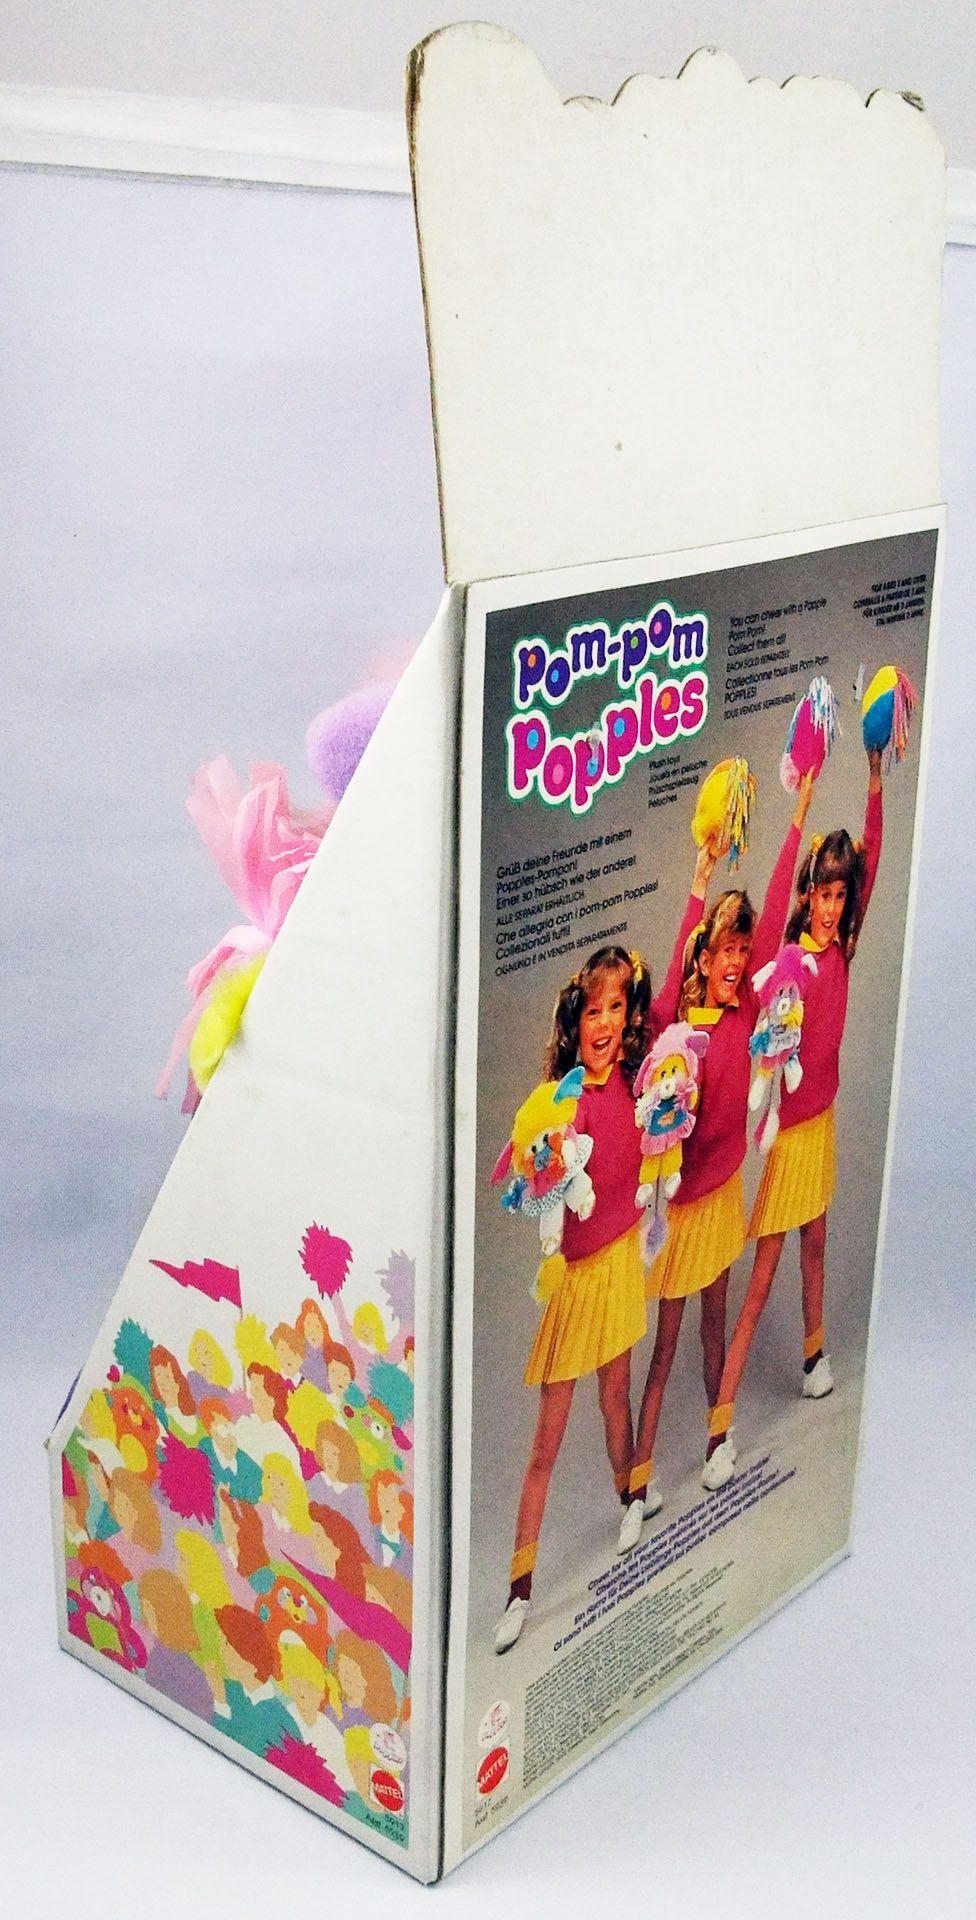 Cheerleader Potato Chip Popples